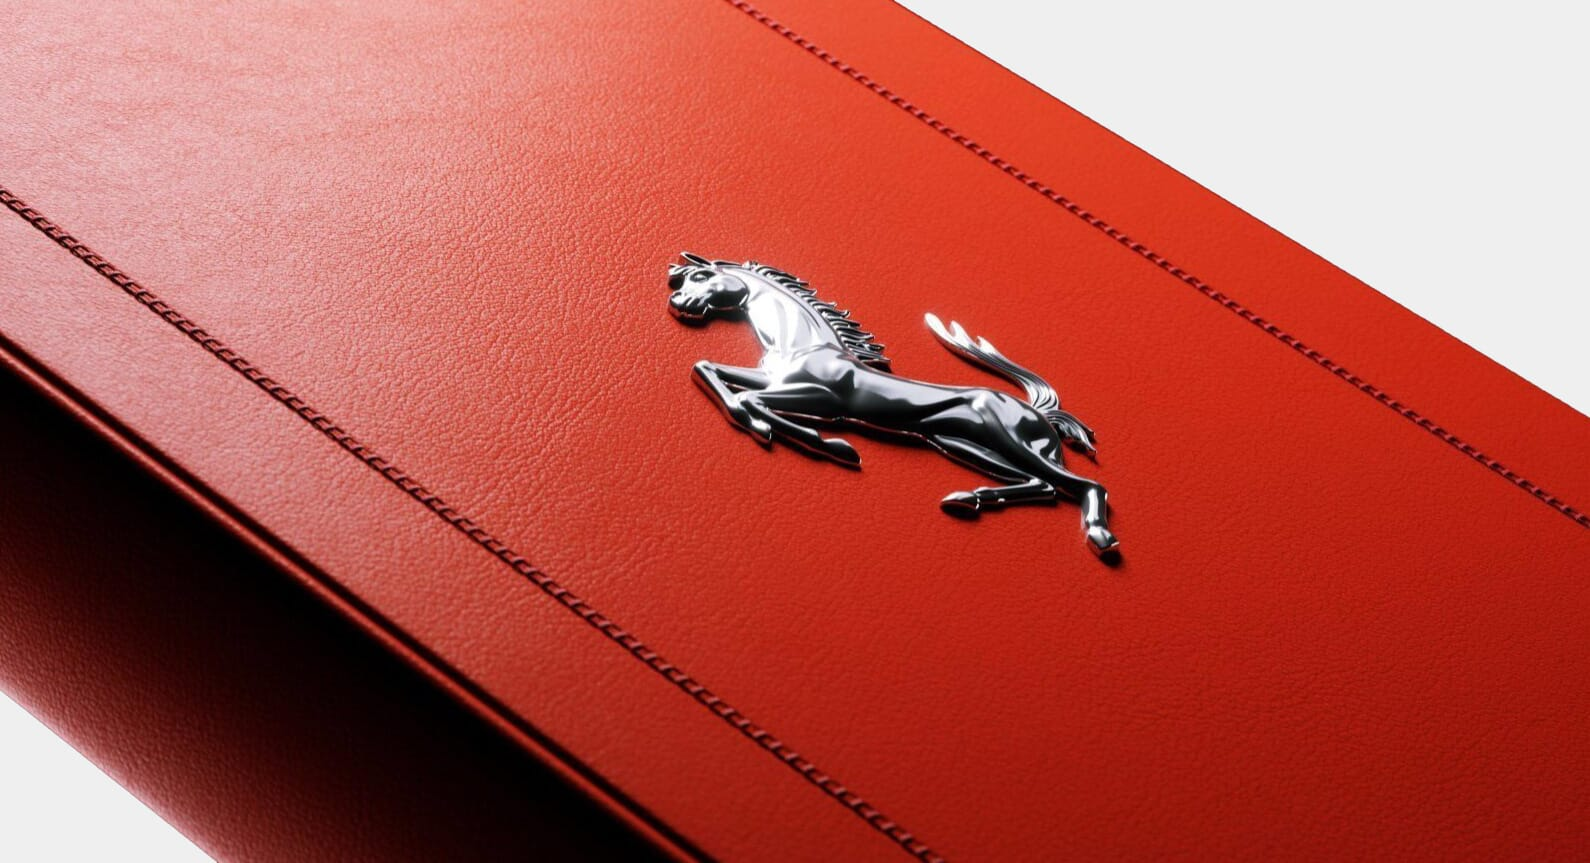 TASCHEN Unveils Incredible Ferrari Tribute Book Designed By Marc Newson